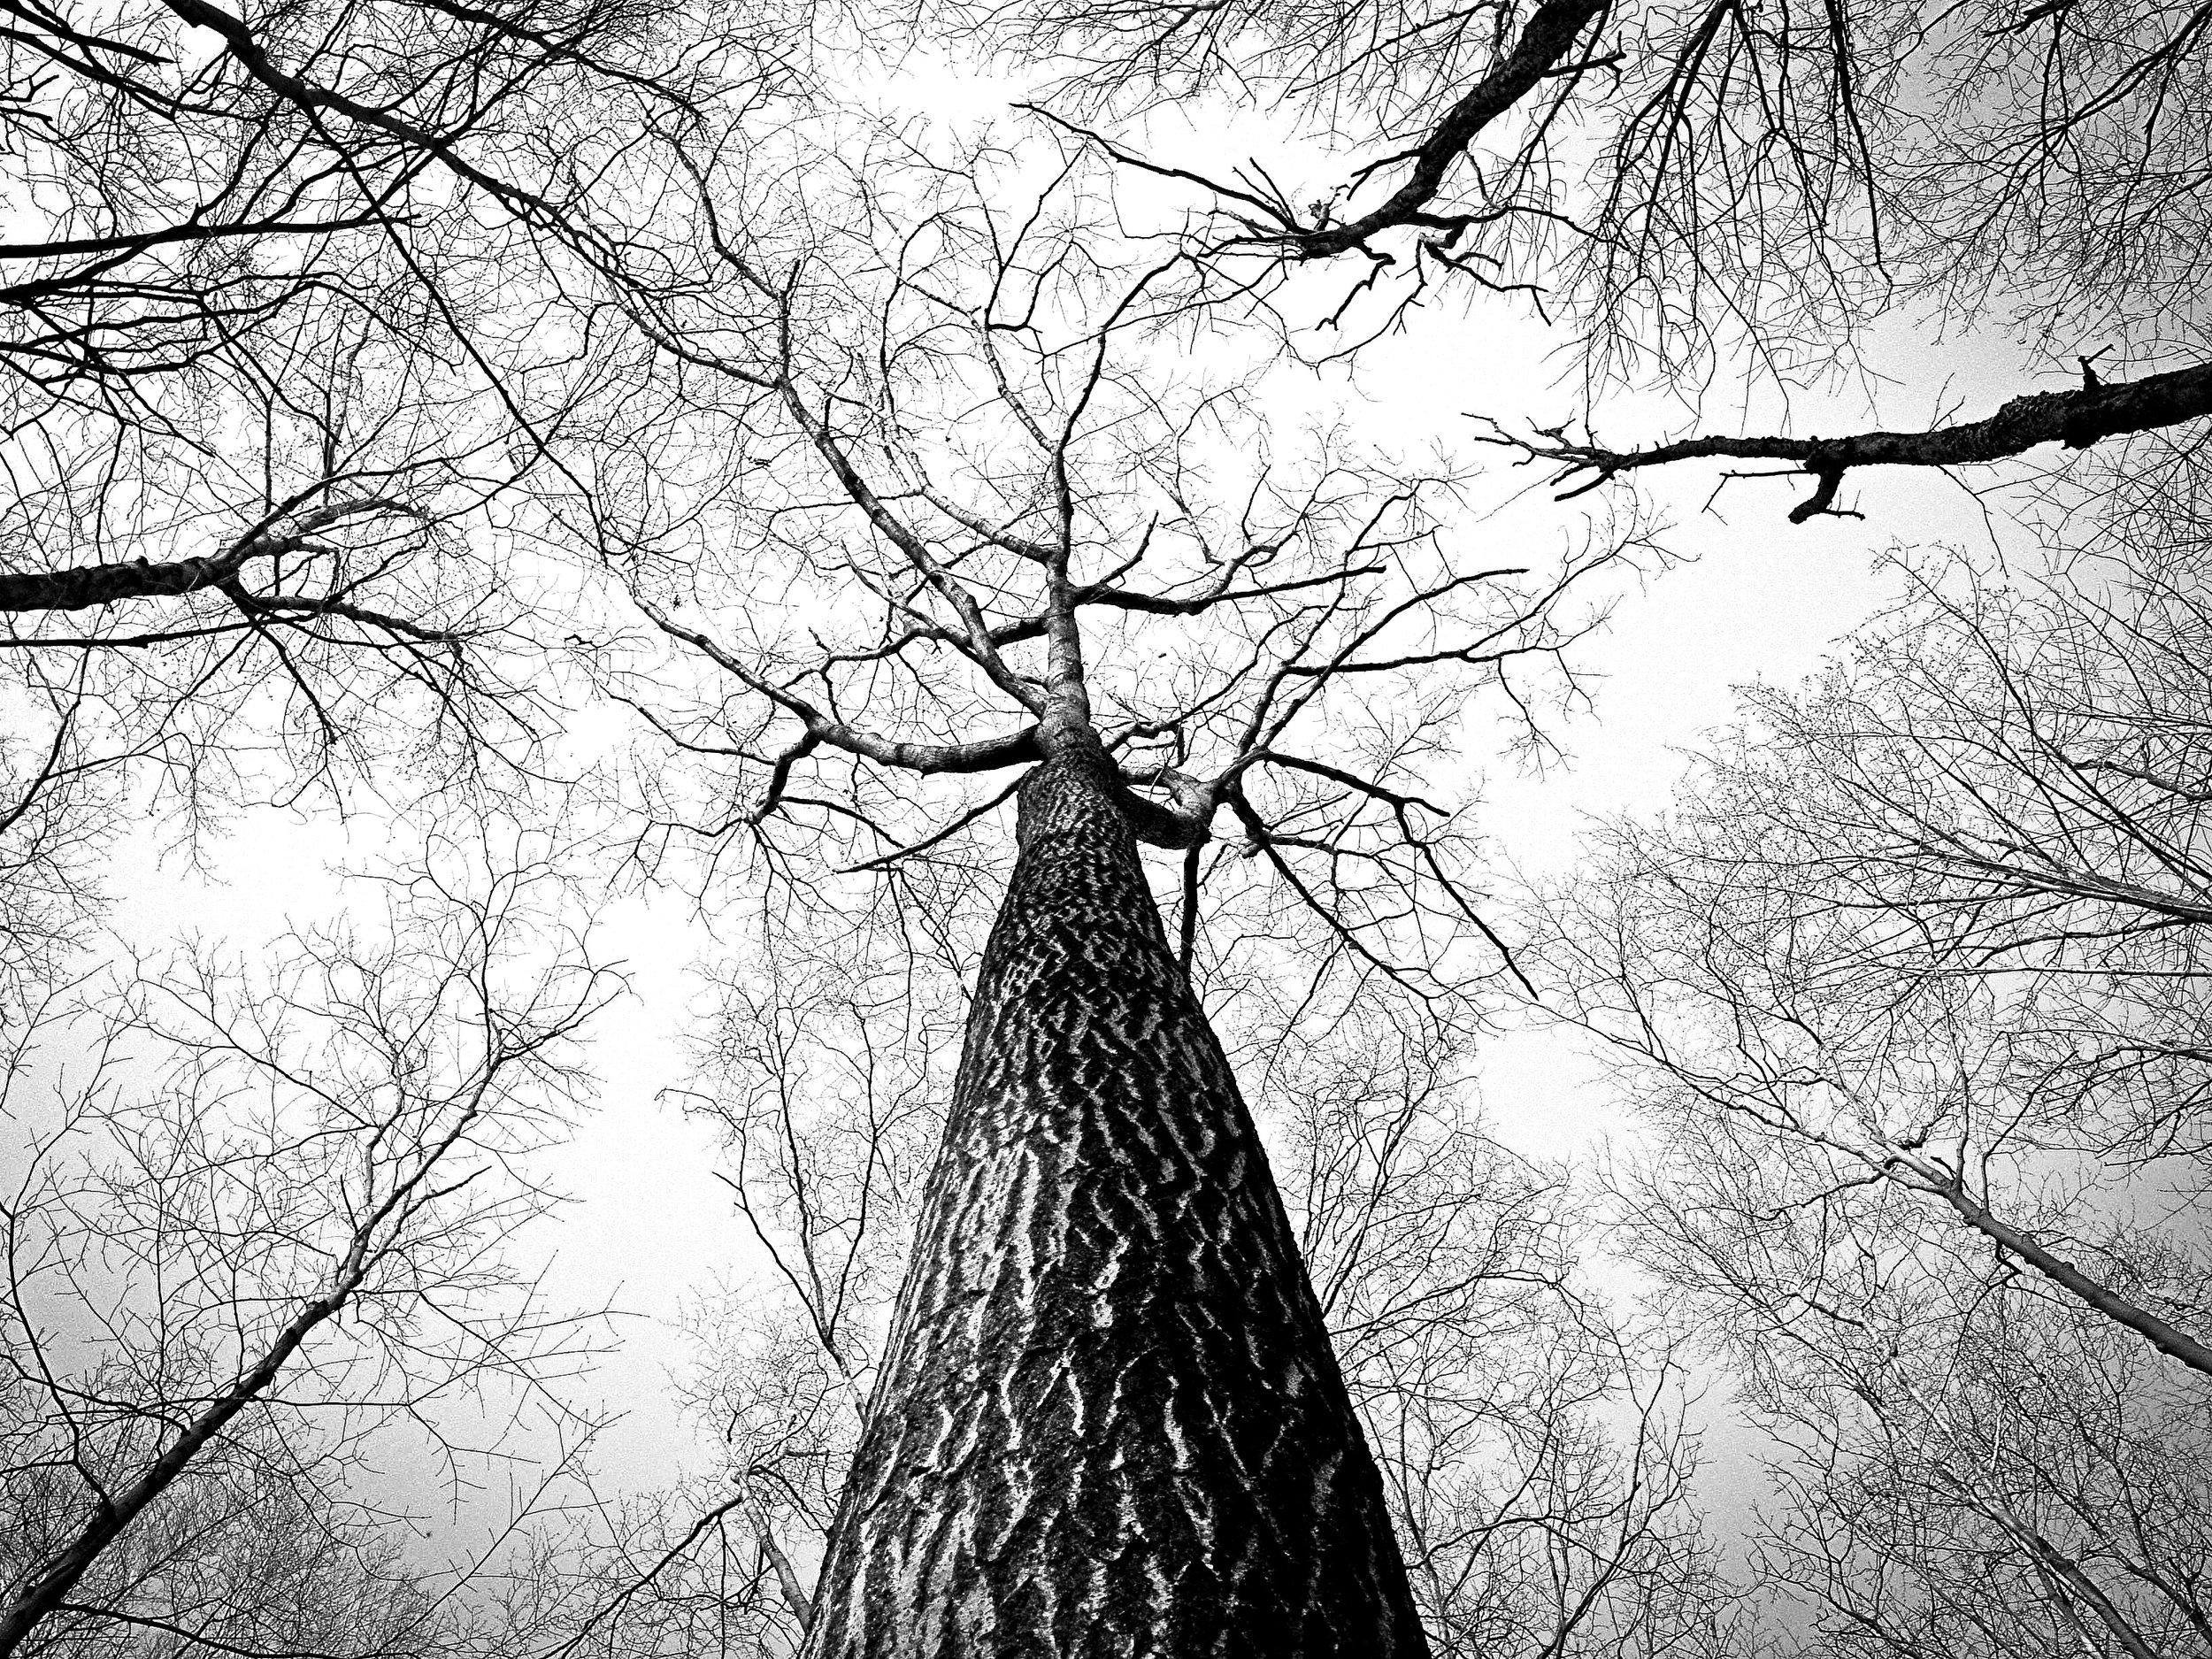 tree-nature-branch-winter-black-and-white-plant-997803-pxhere.com.jpg